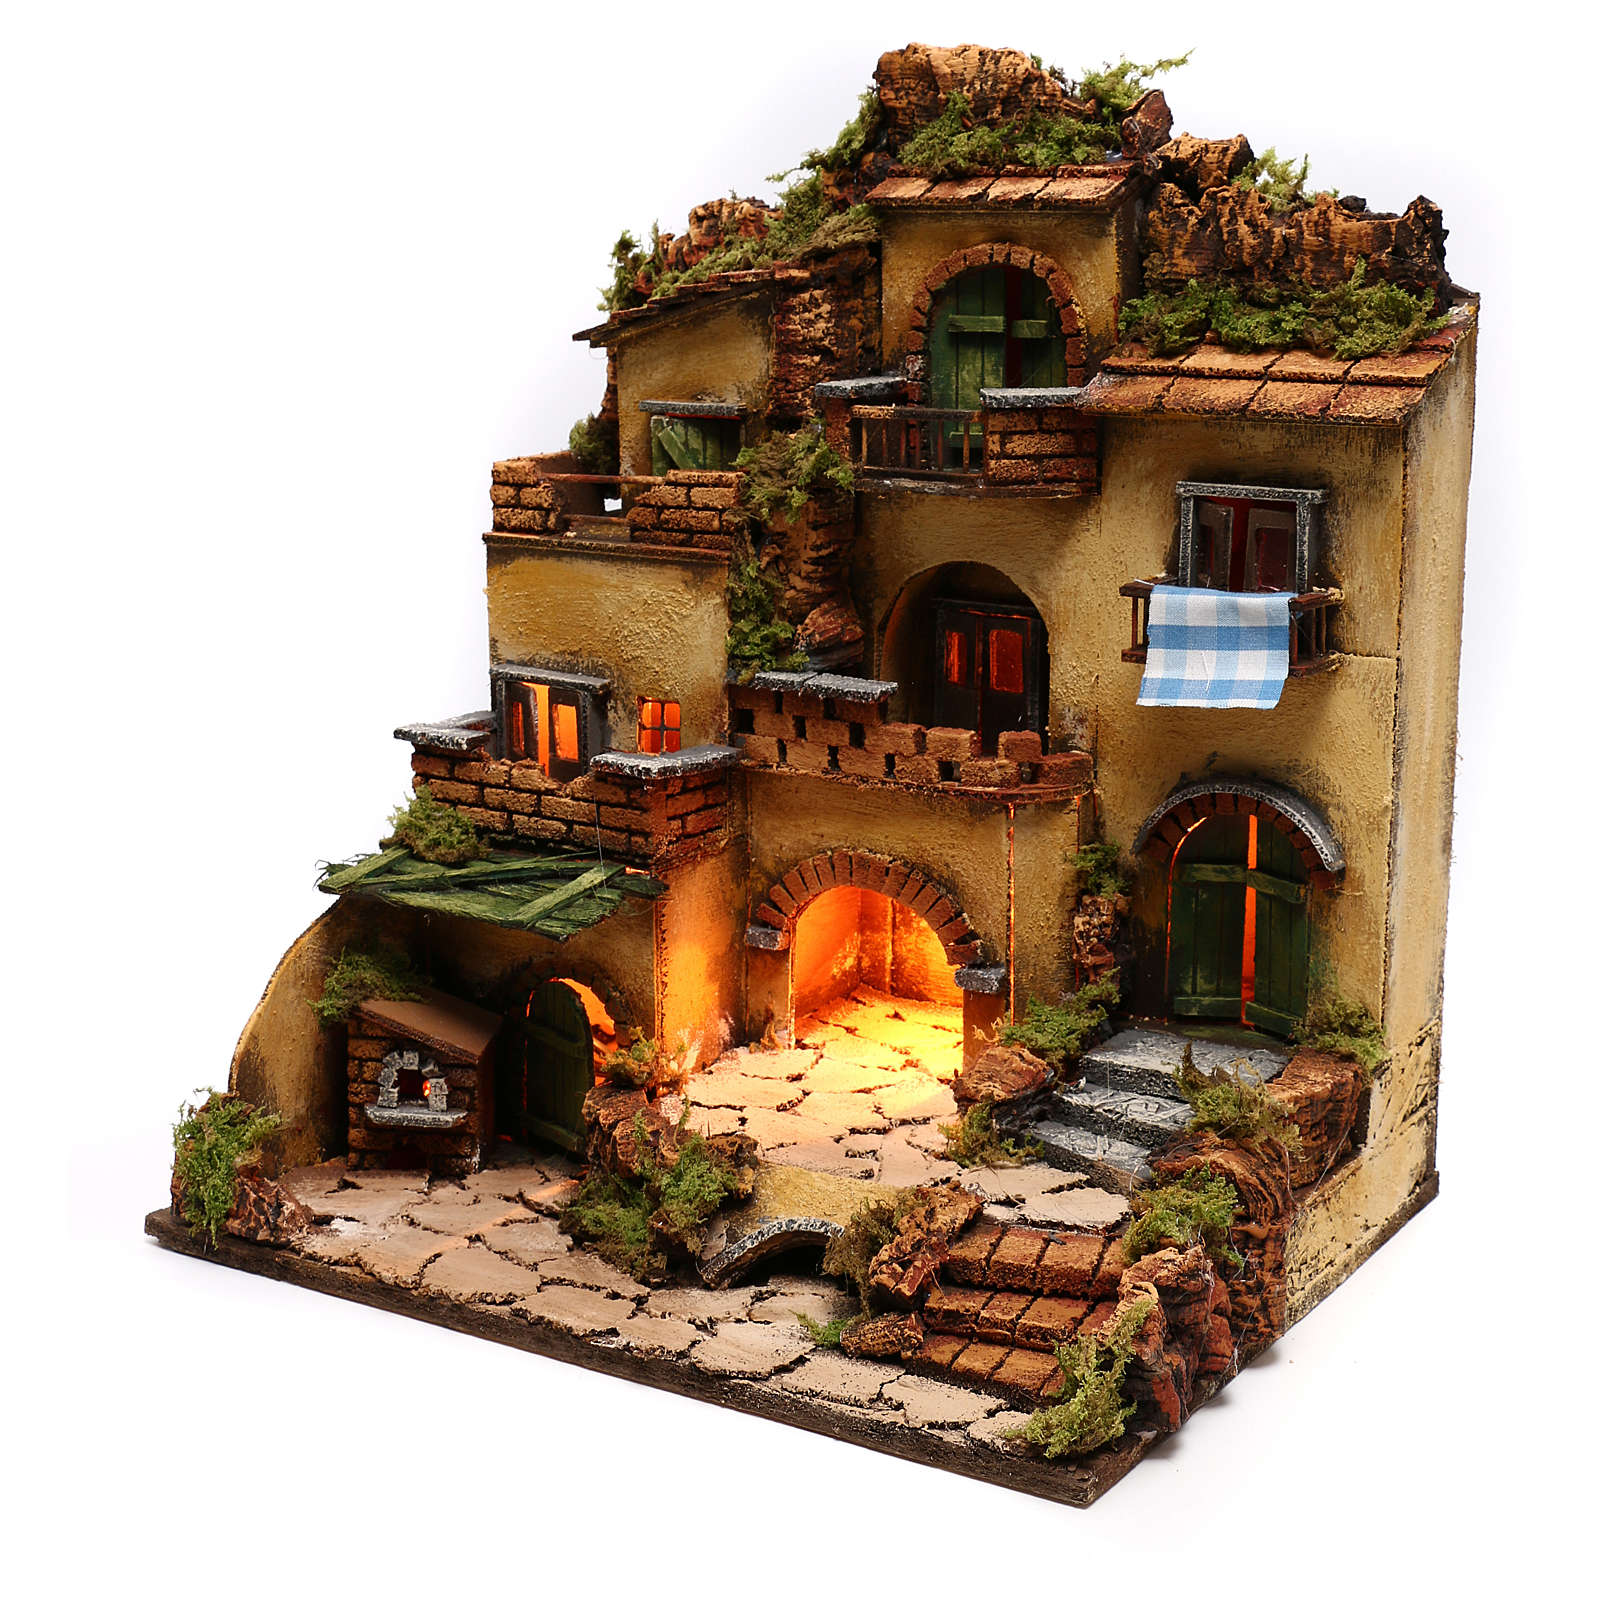 Neapolitan nativity, village 1700 style with grotto 45x35x33cm 4